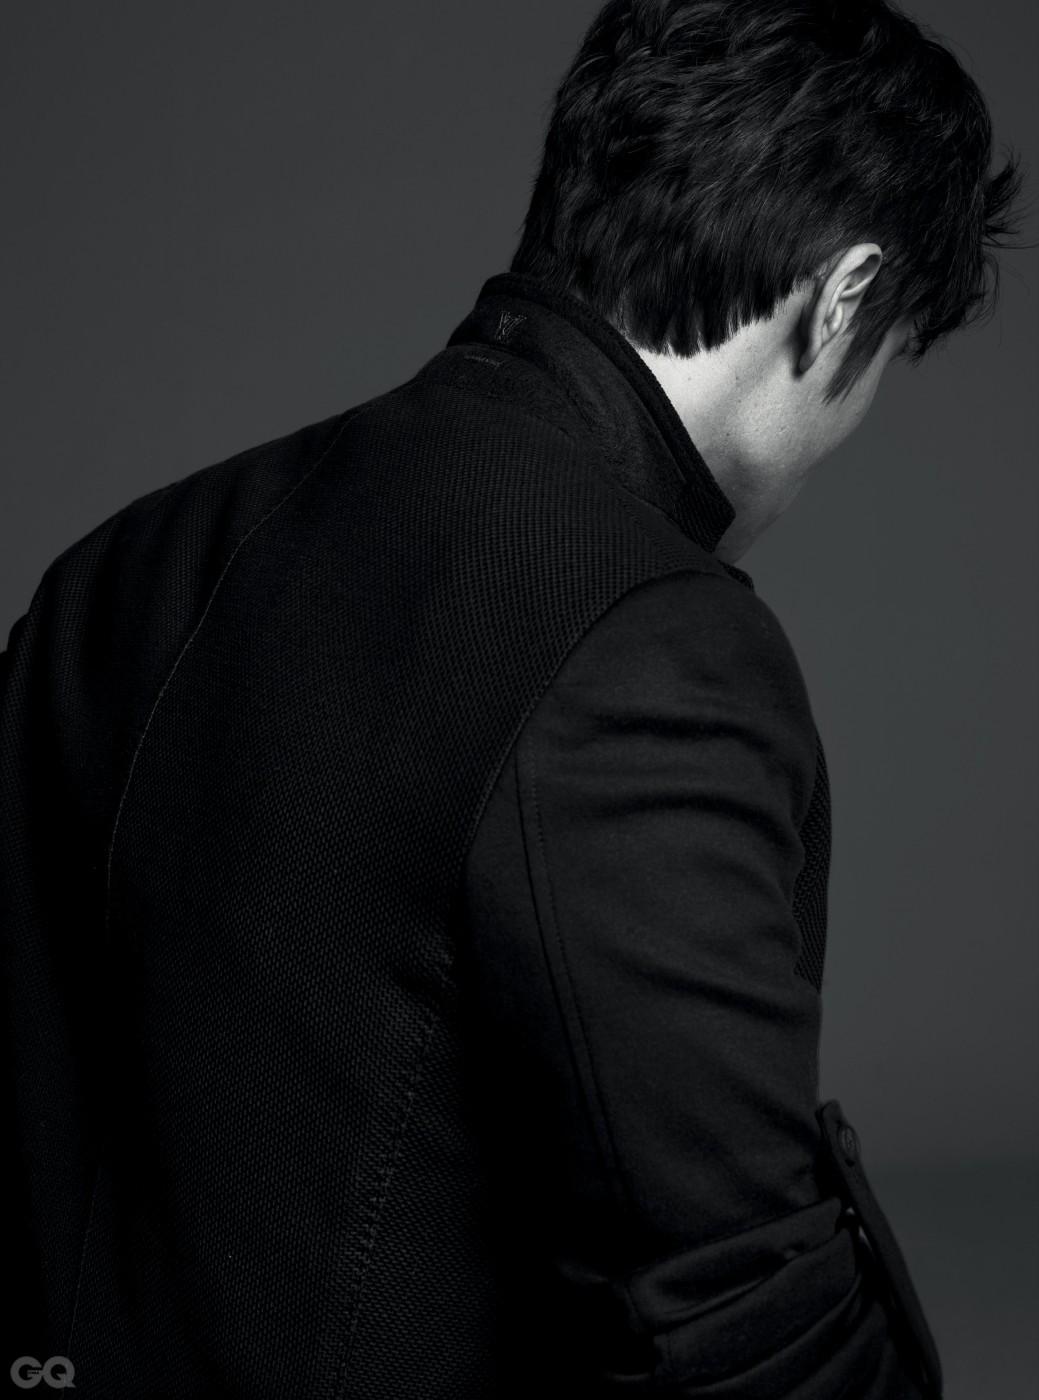 414GQL-이병헌-15